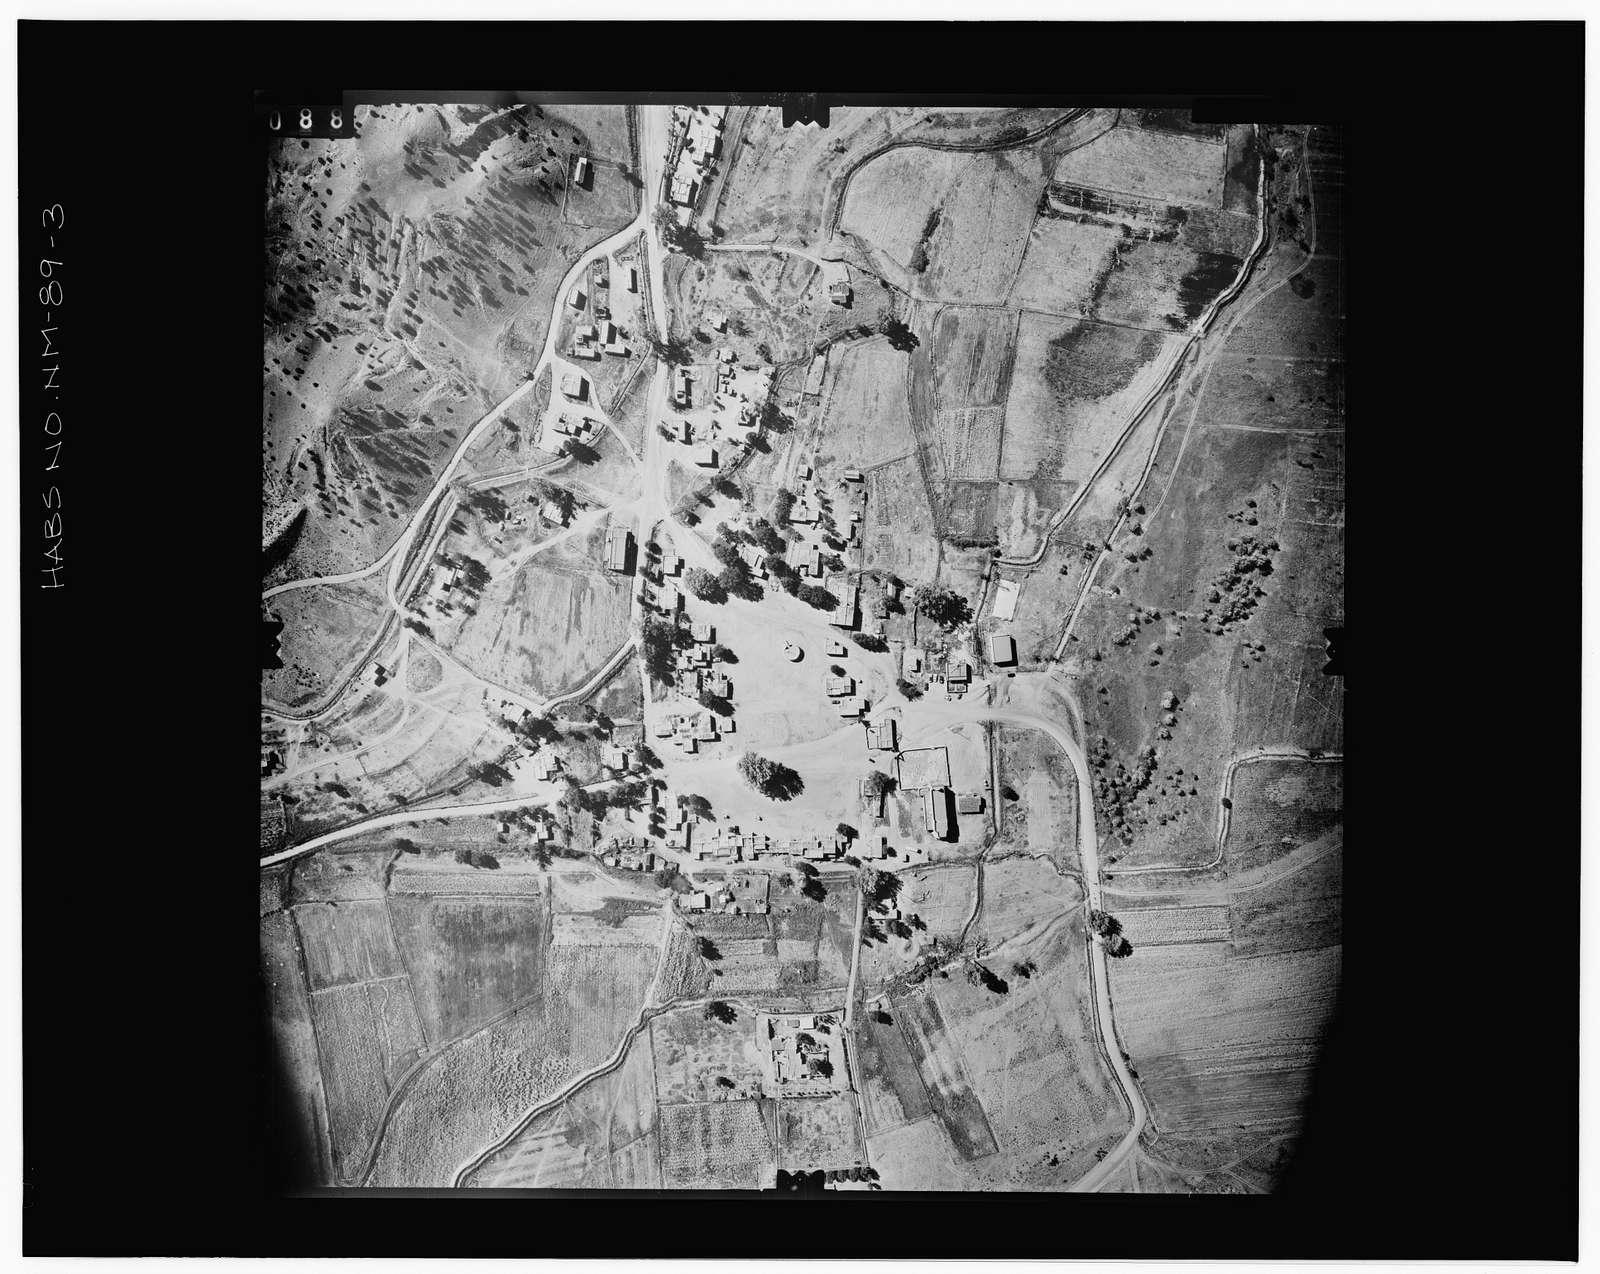 Pueblo of San Ildefonso, State Road 4 Vicinity, San Ildefonso Pueblo, Santa Fe County, NM